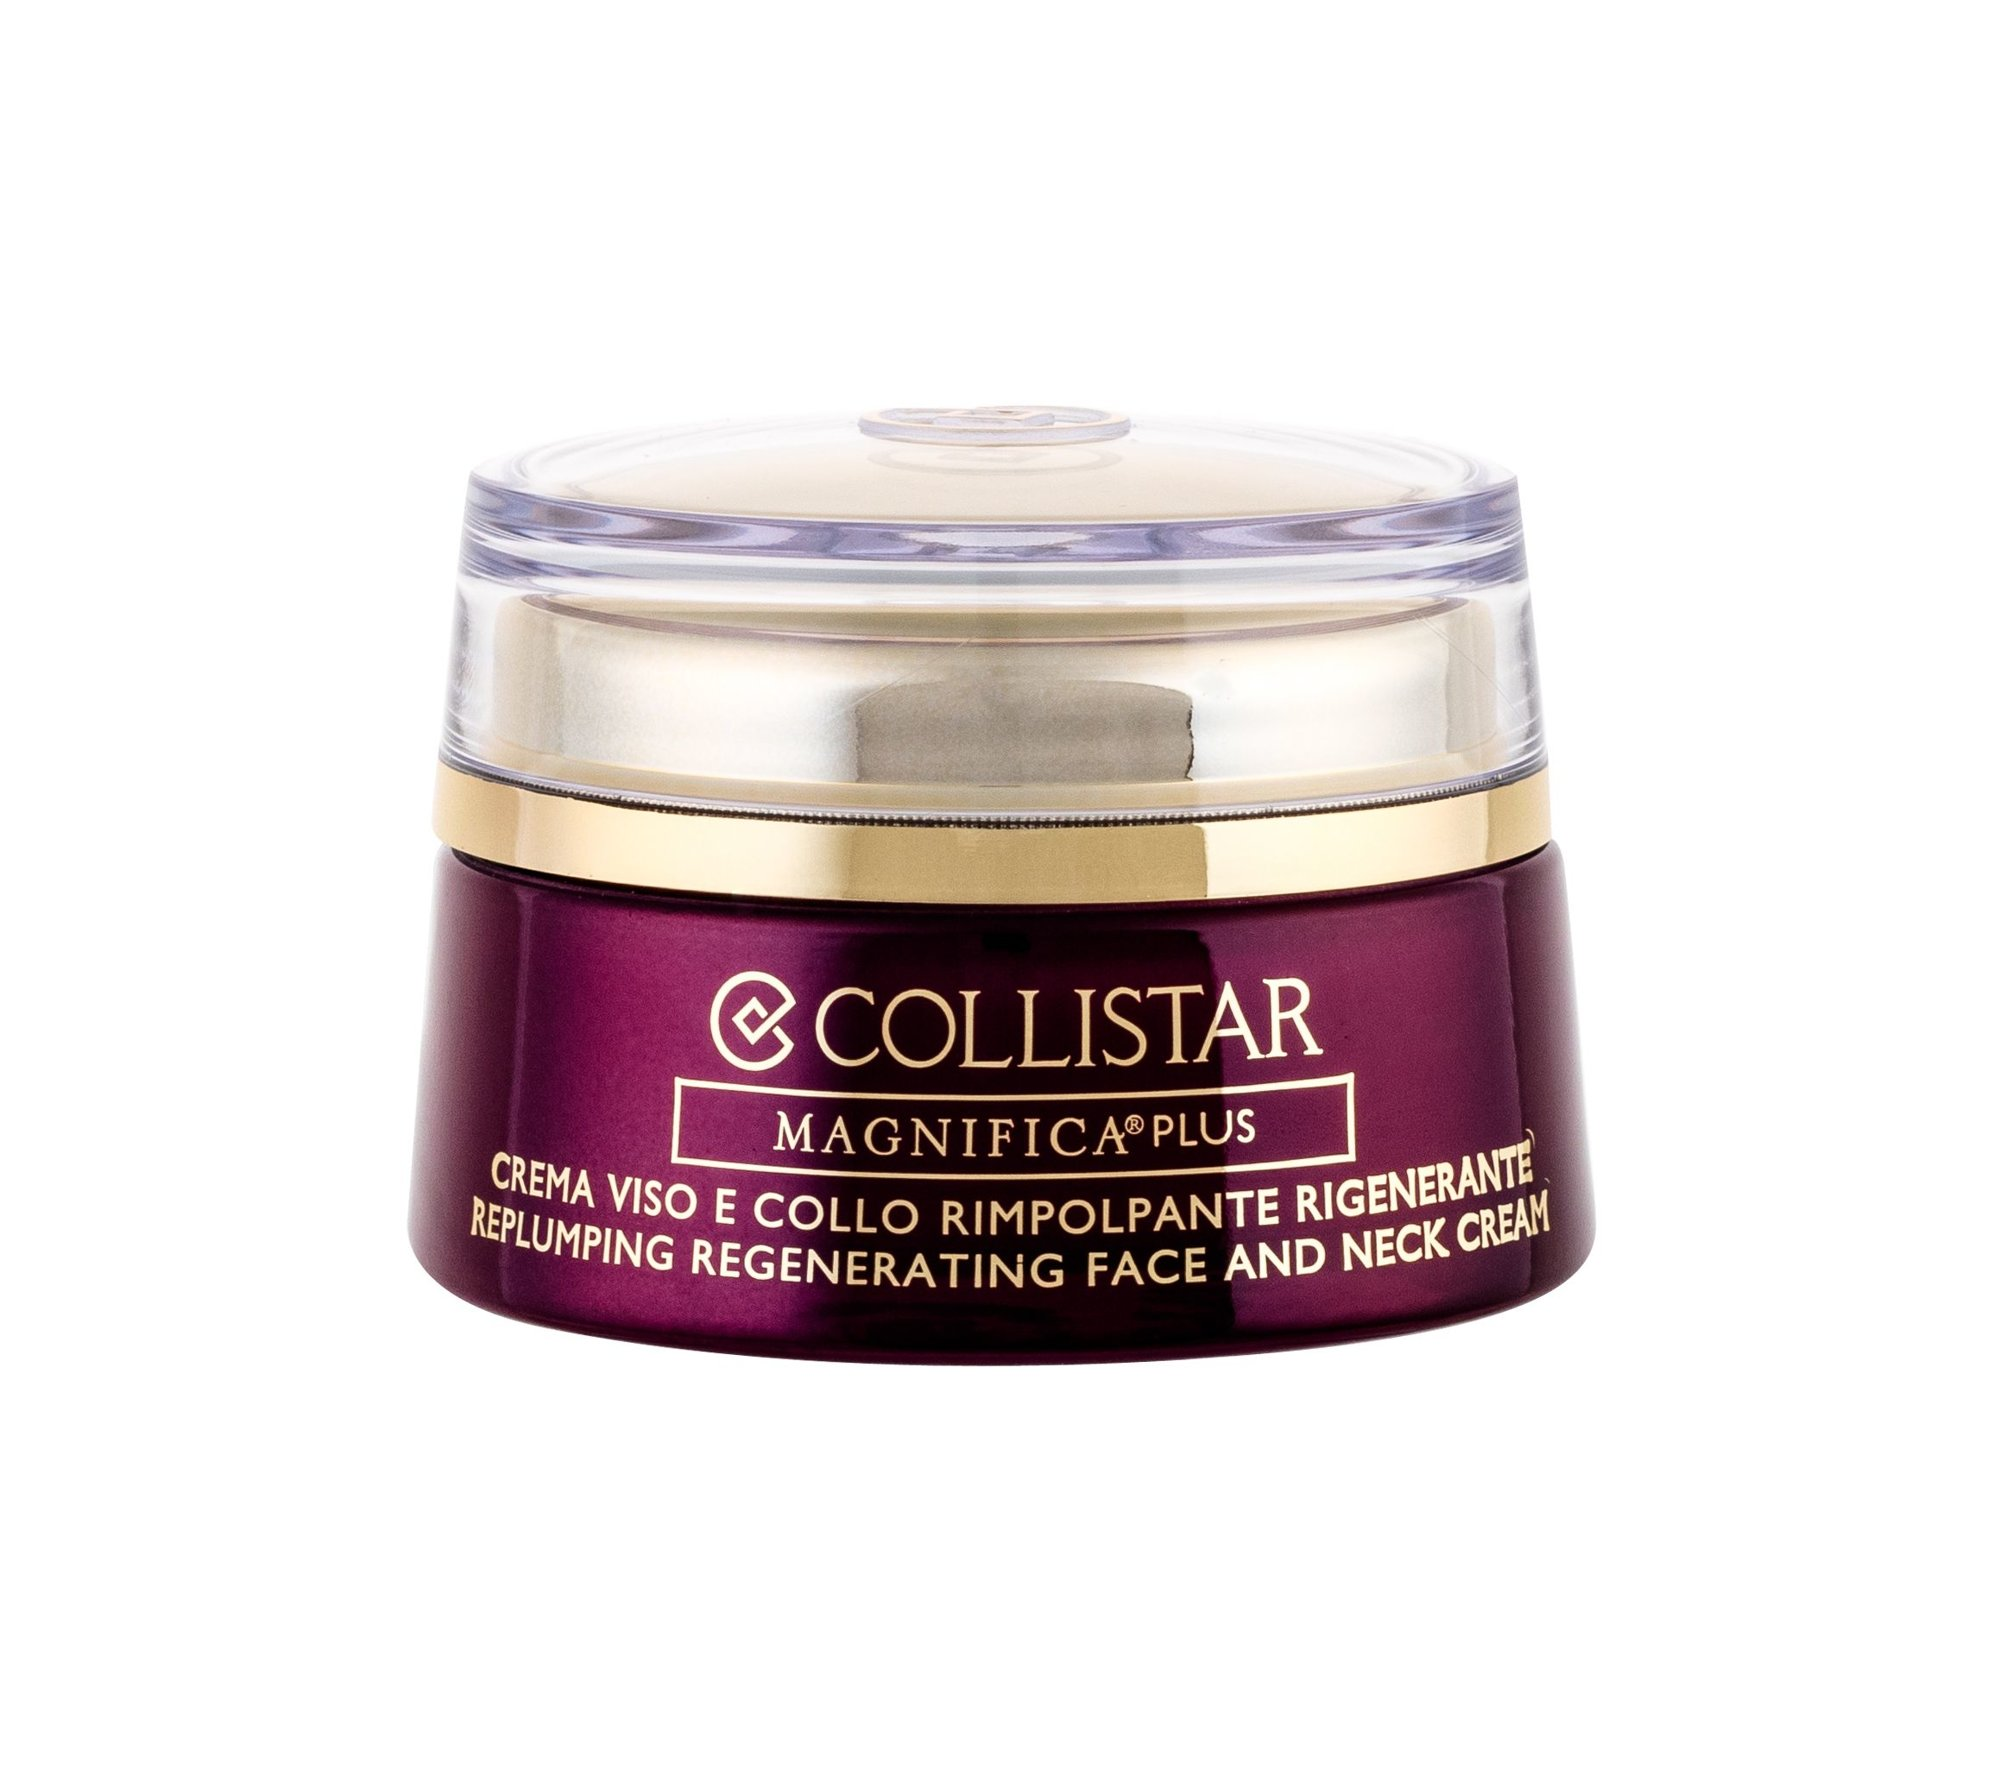 Collistar Magnifica Plus Day Cream 50ml